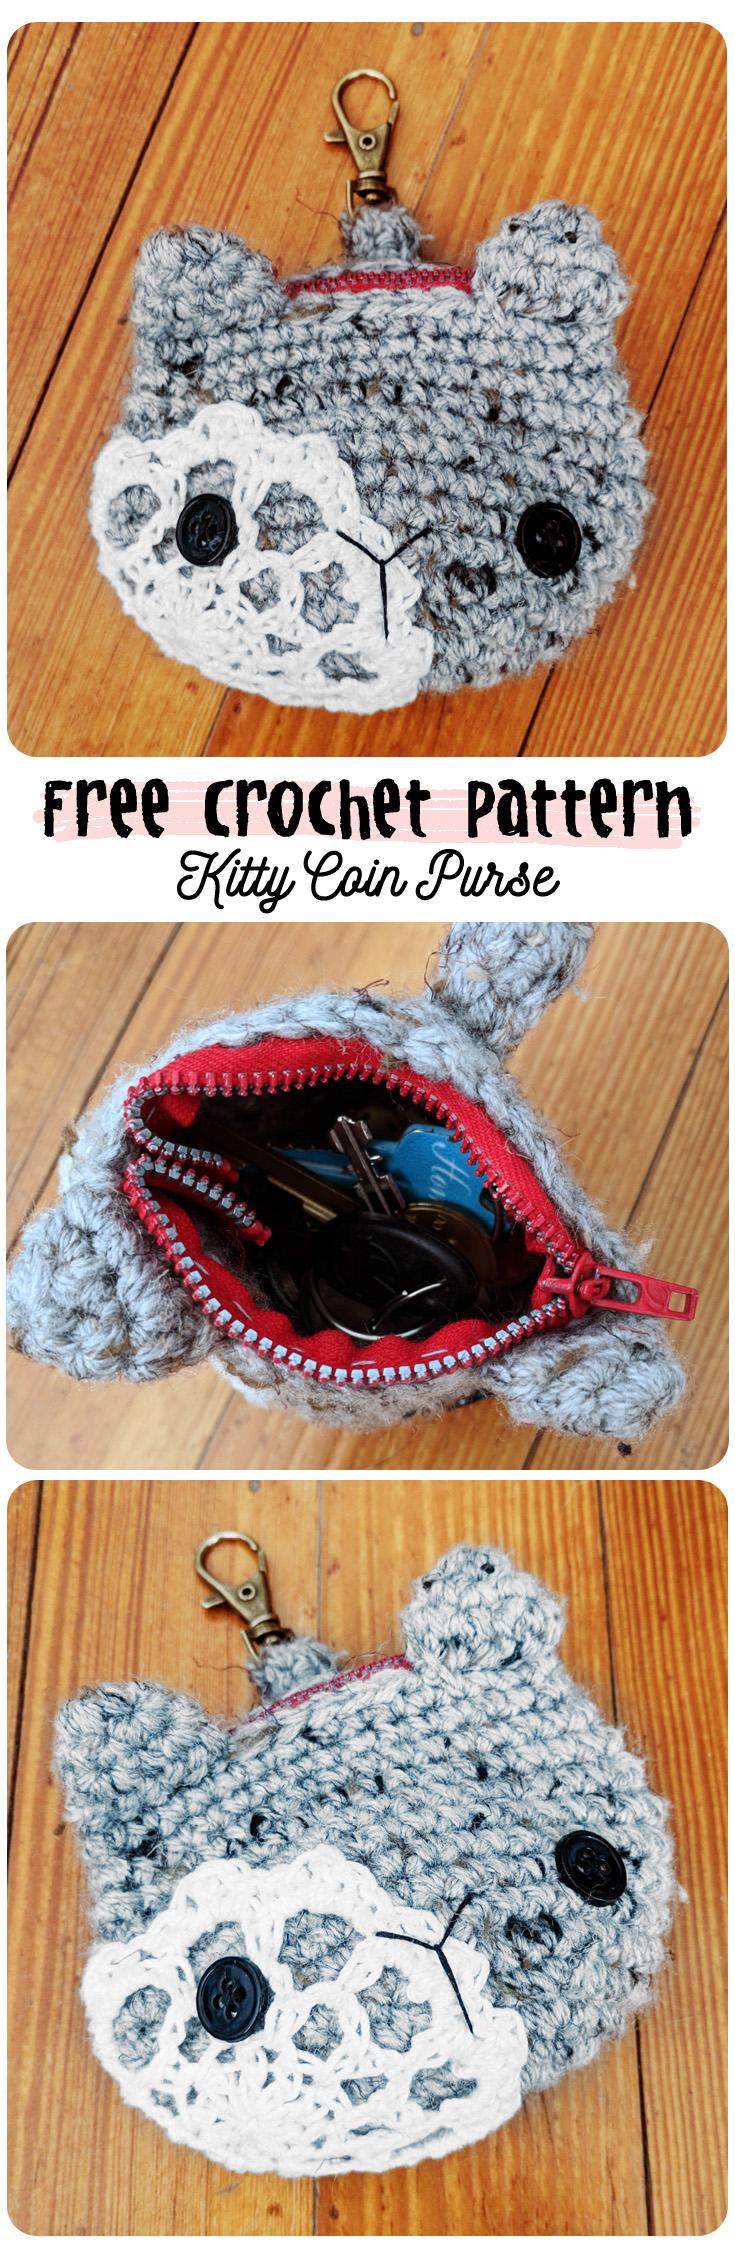 free-crochet-pattern-kitty-coin-purse (1).jpg